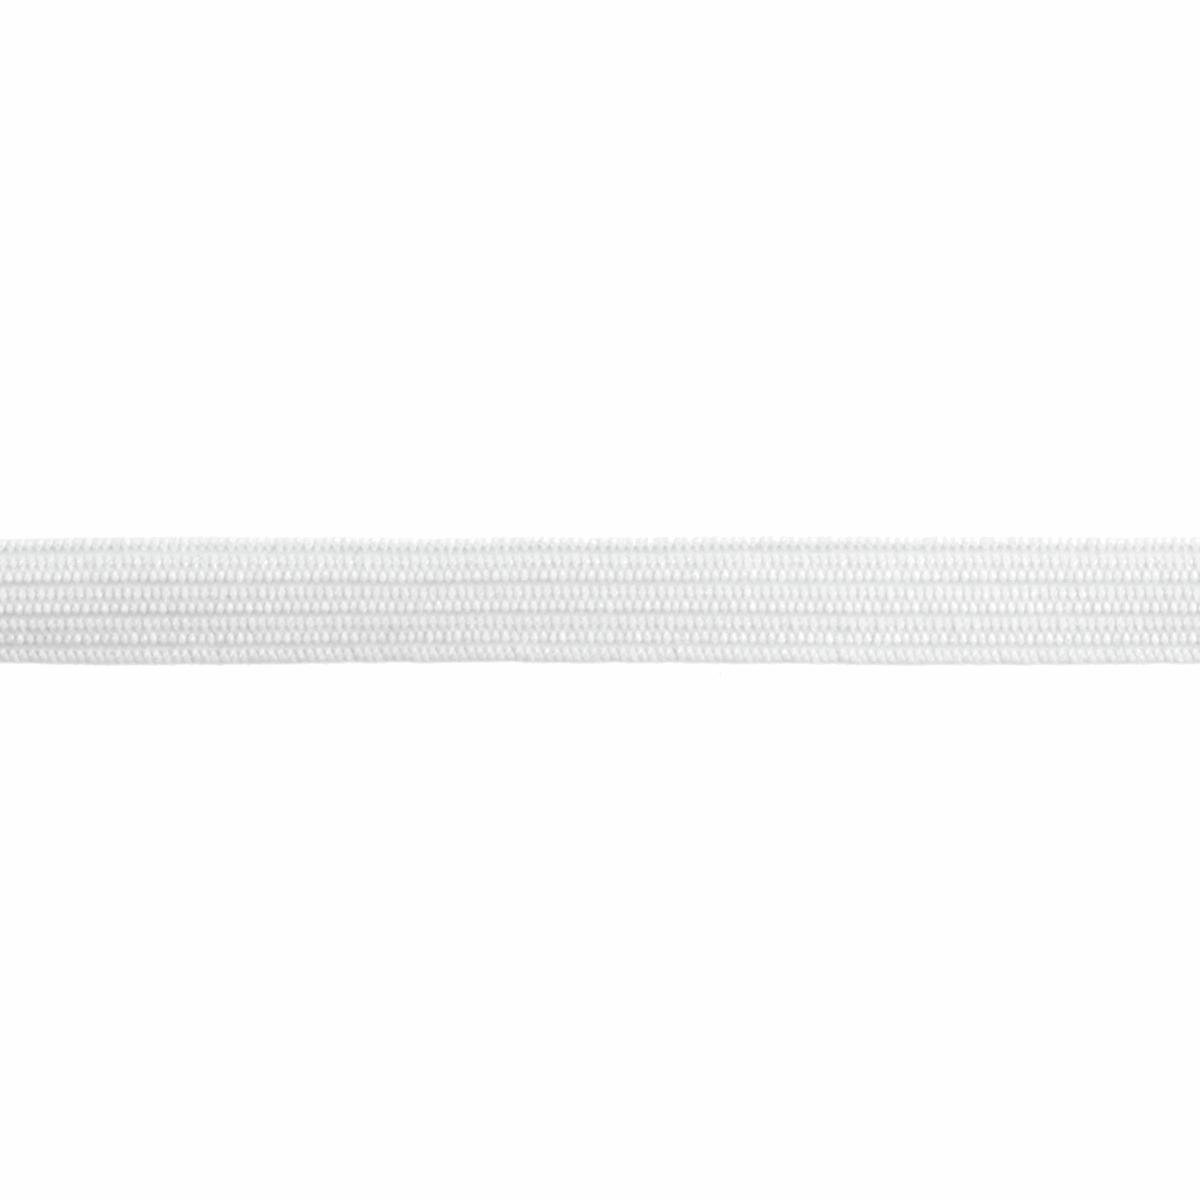 Elastic 5mm White braided